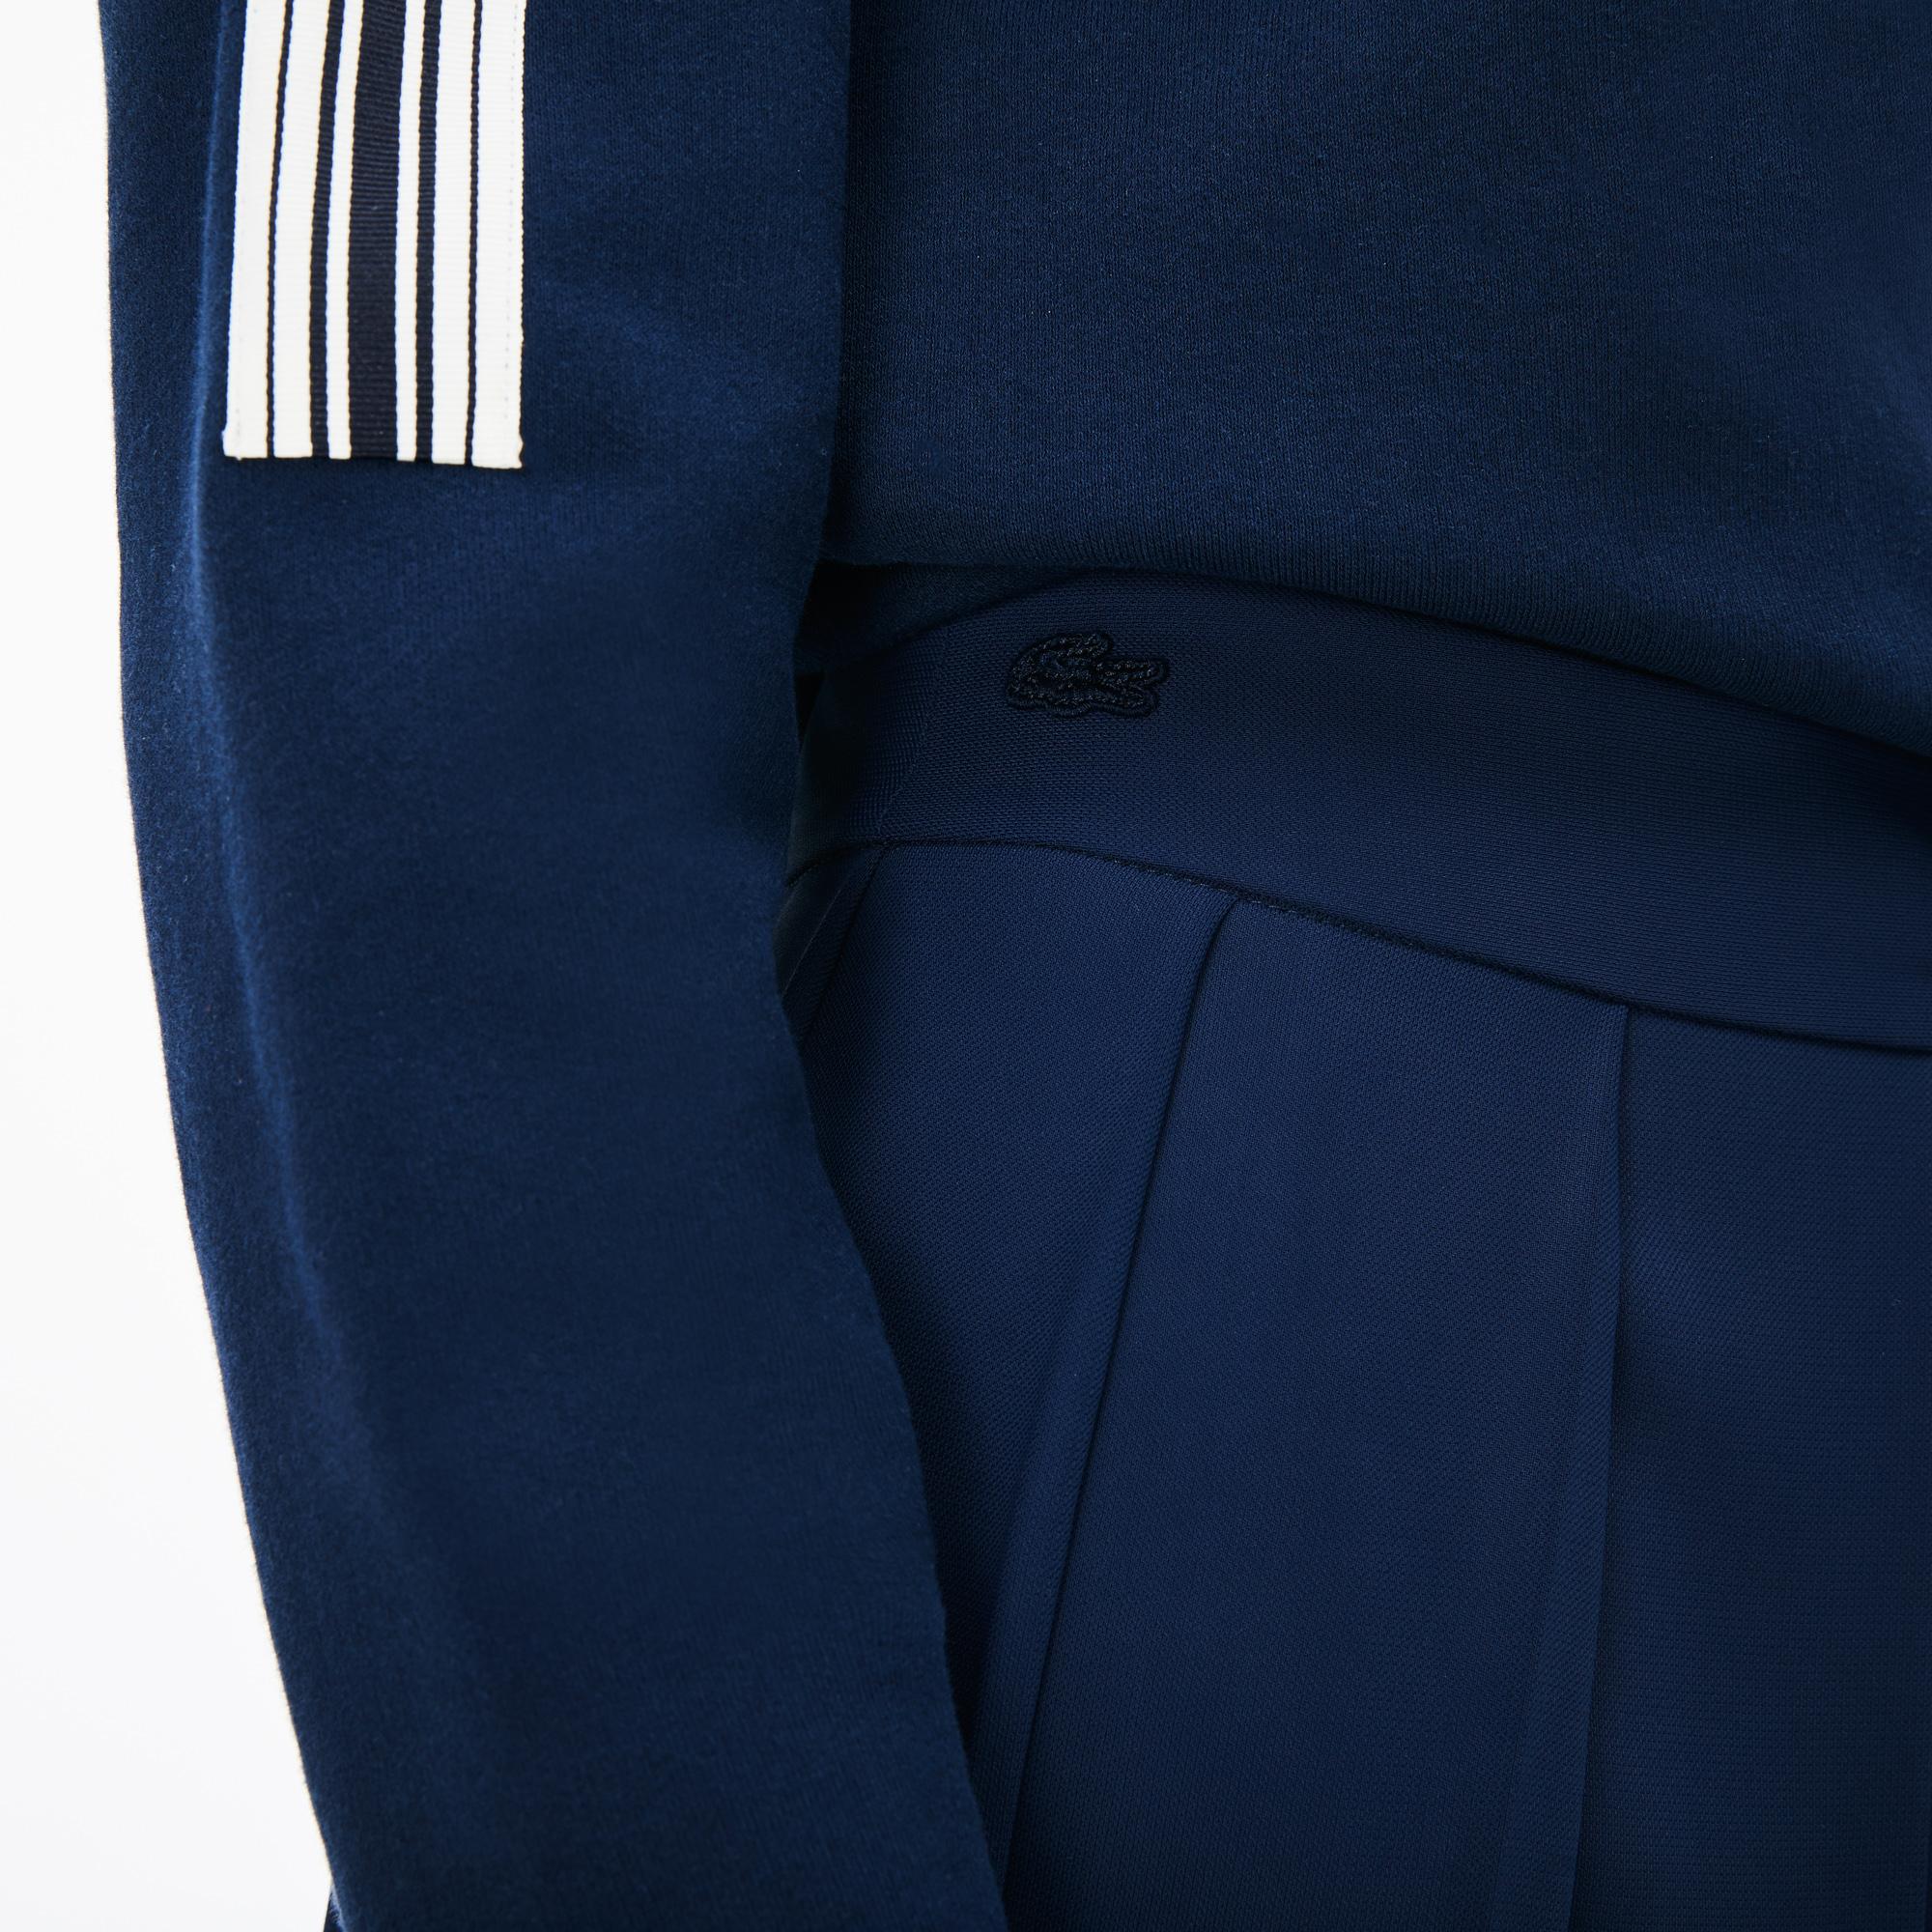 Фото 3 - Юбку Lacoste темно-синего цвета